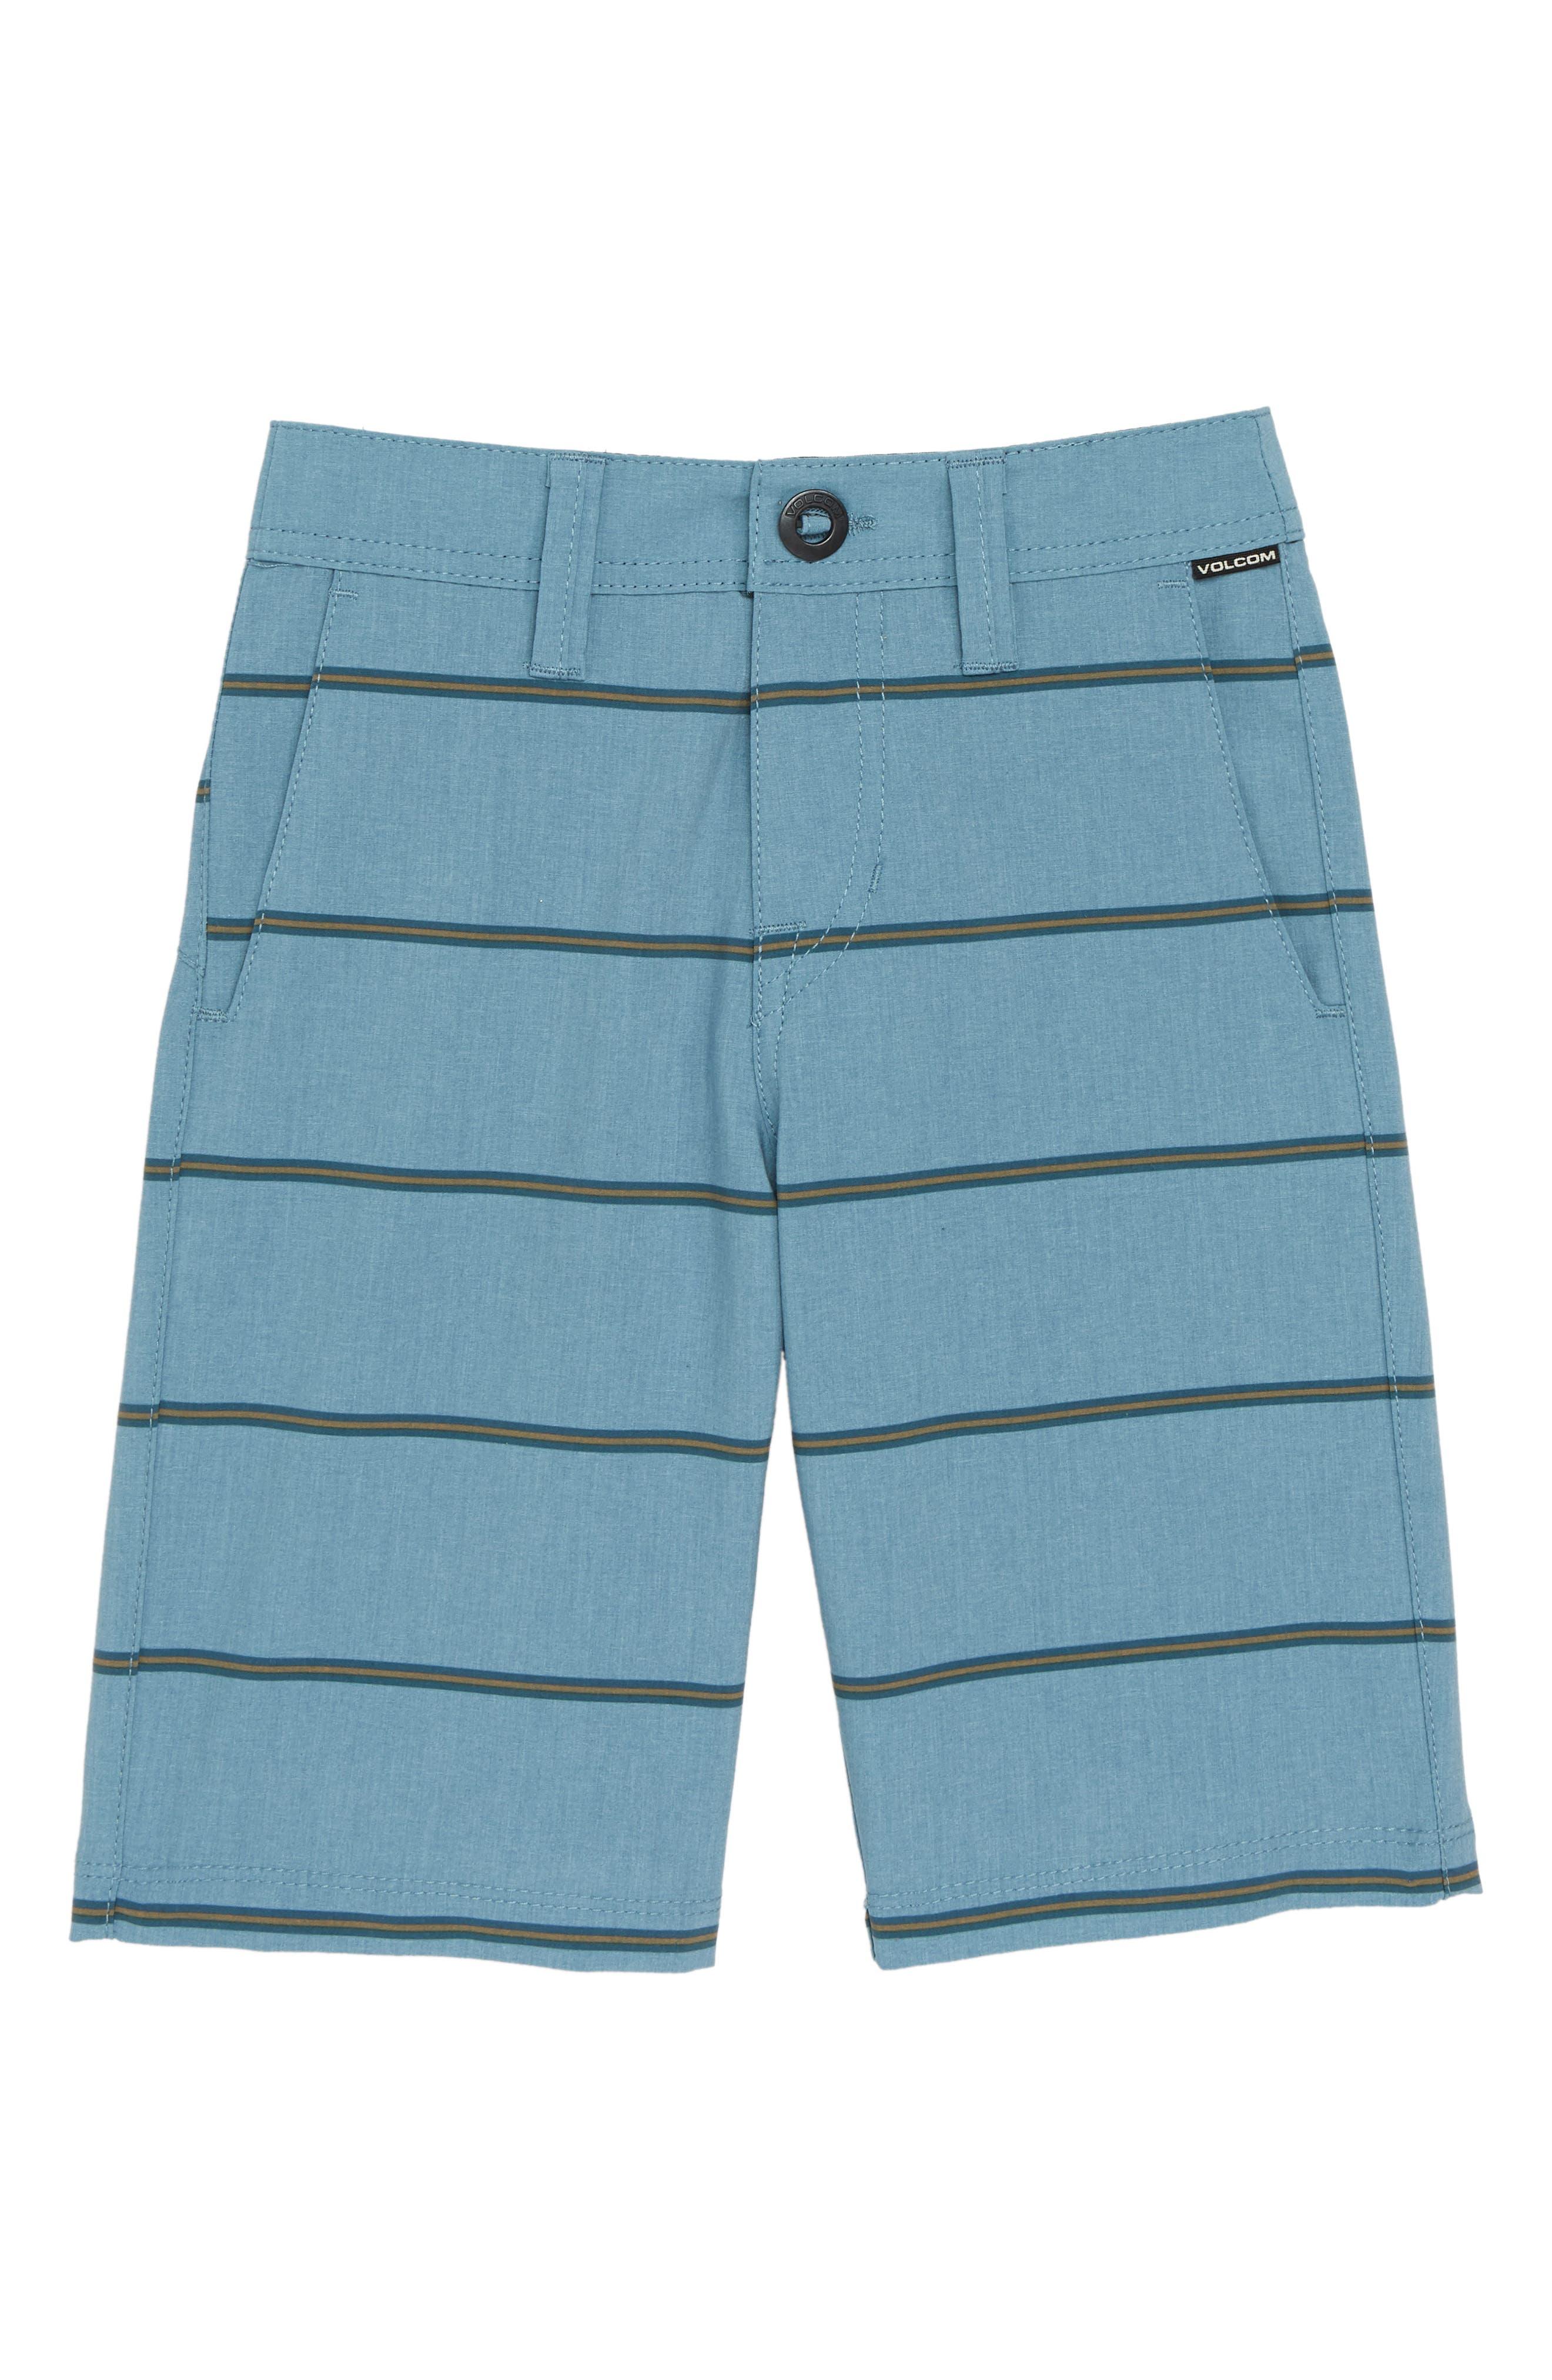 Frickin Surf N' Turf Mix Hybrid Shorts,                             Main thumbnail 1, color,                             Wrecked Indigo